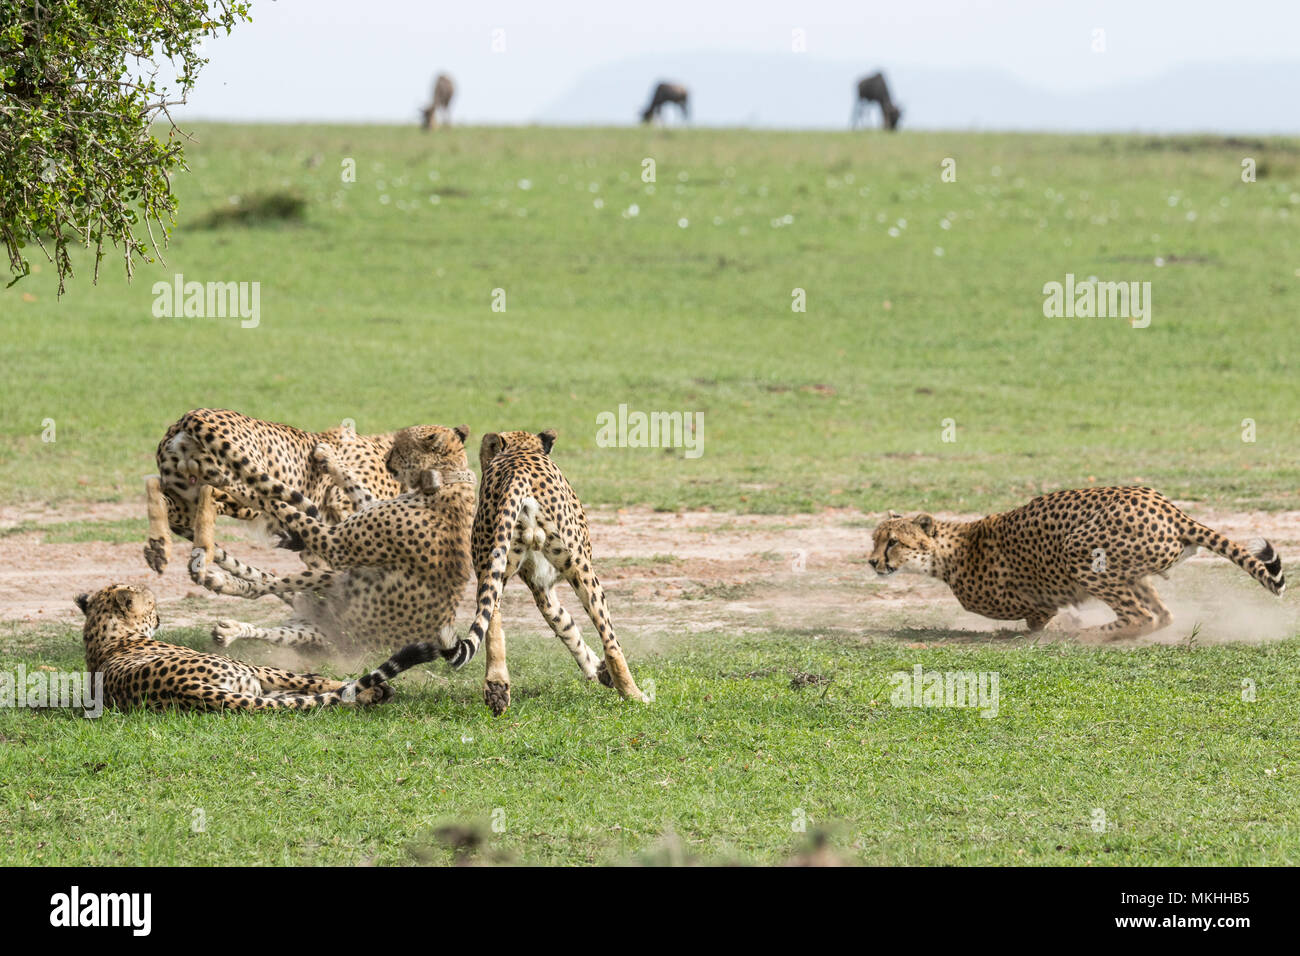 Cheetah (Acinonyx jubatus), an association of 5 males in conflict, Masai-Mara National Reserve, Kenya Stock Photo